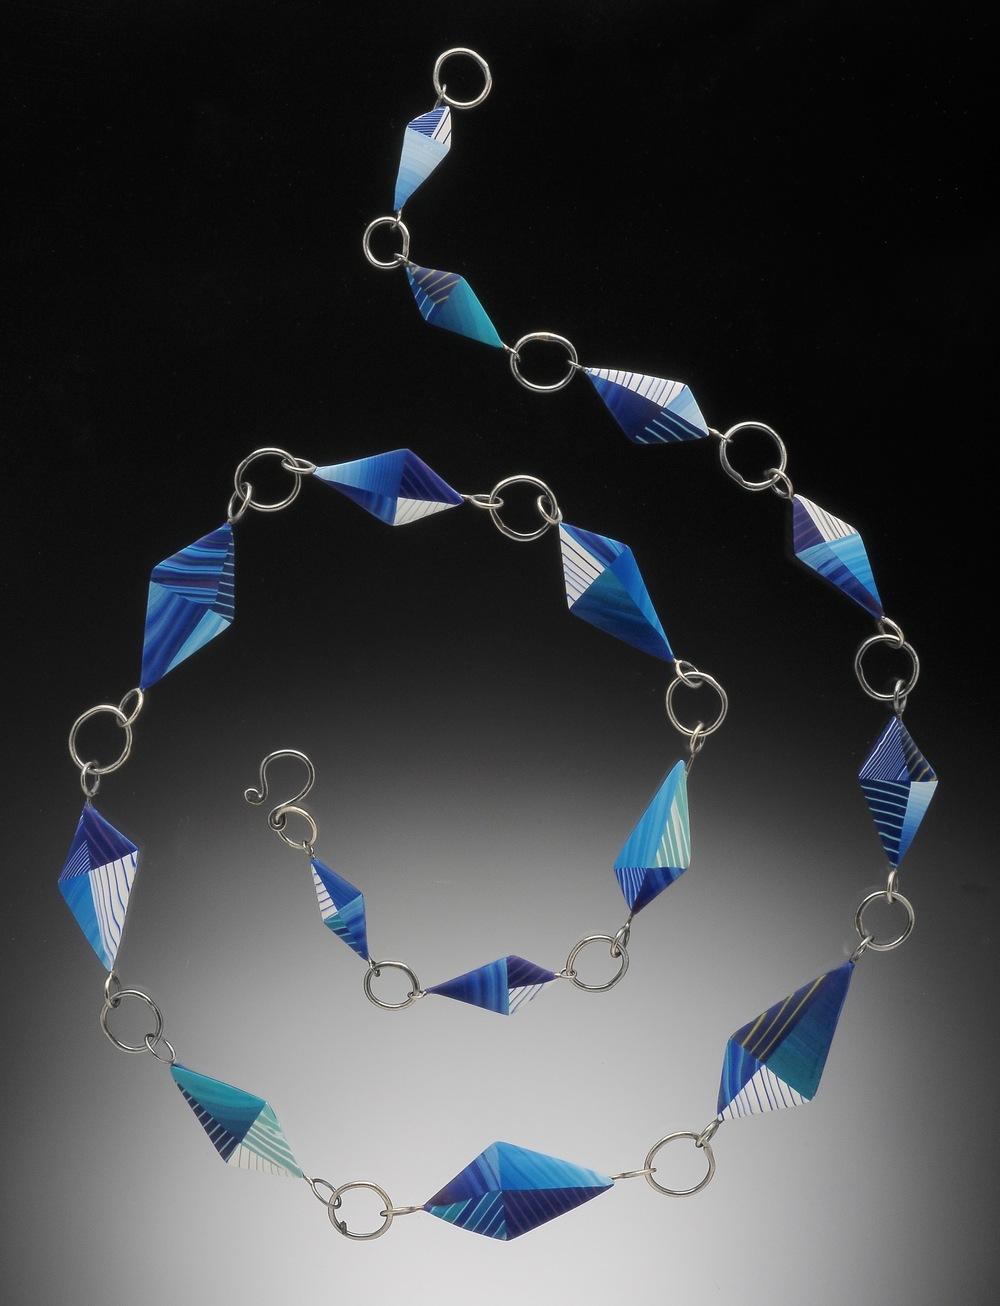 kite, songbird series necklace